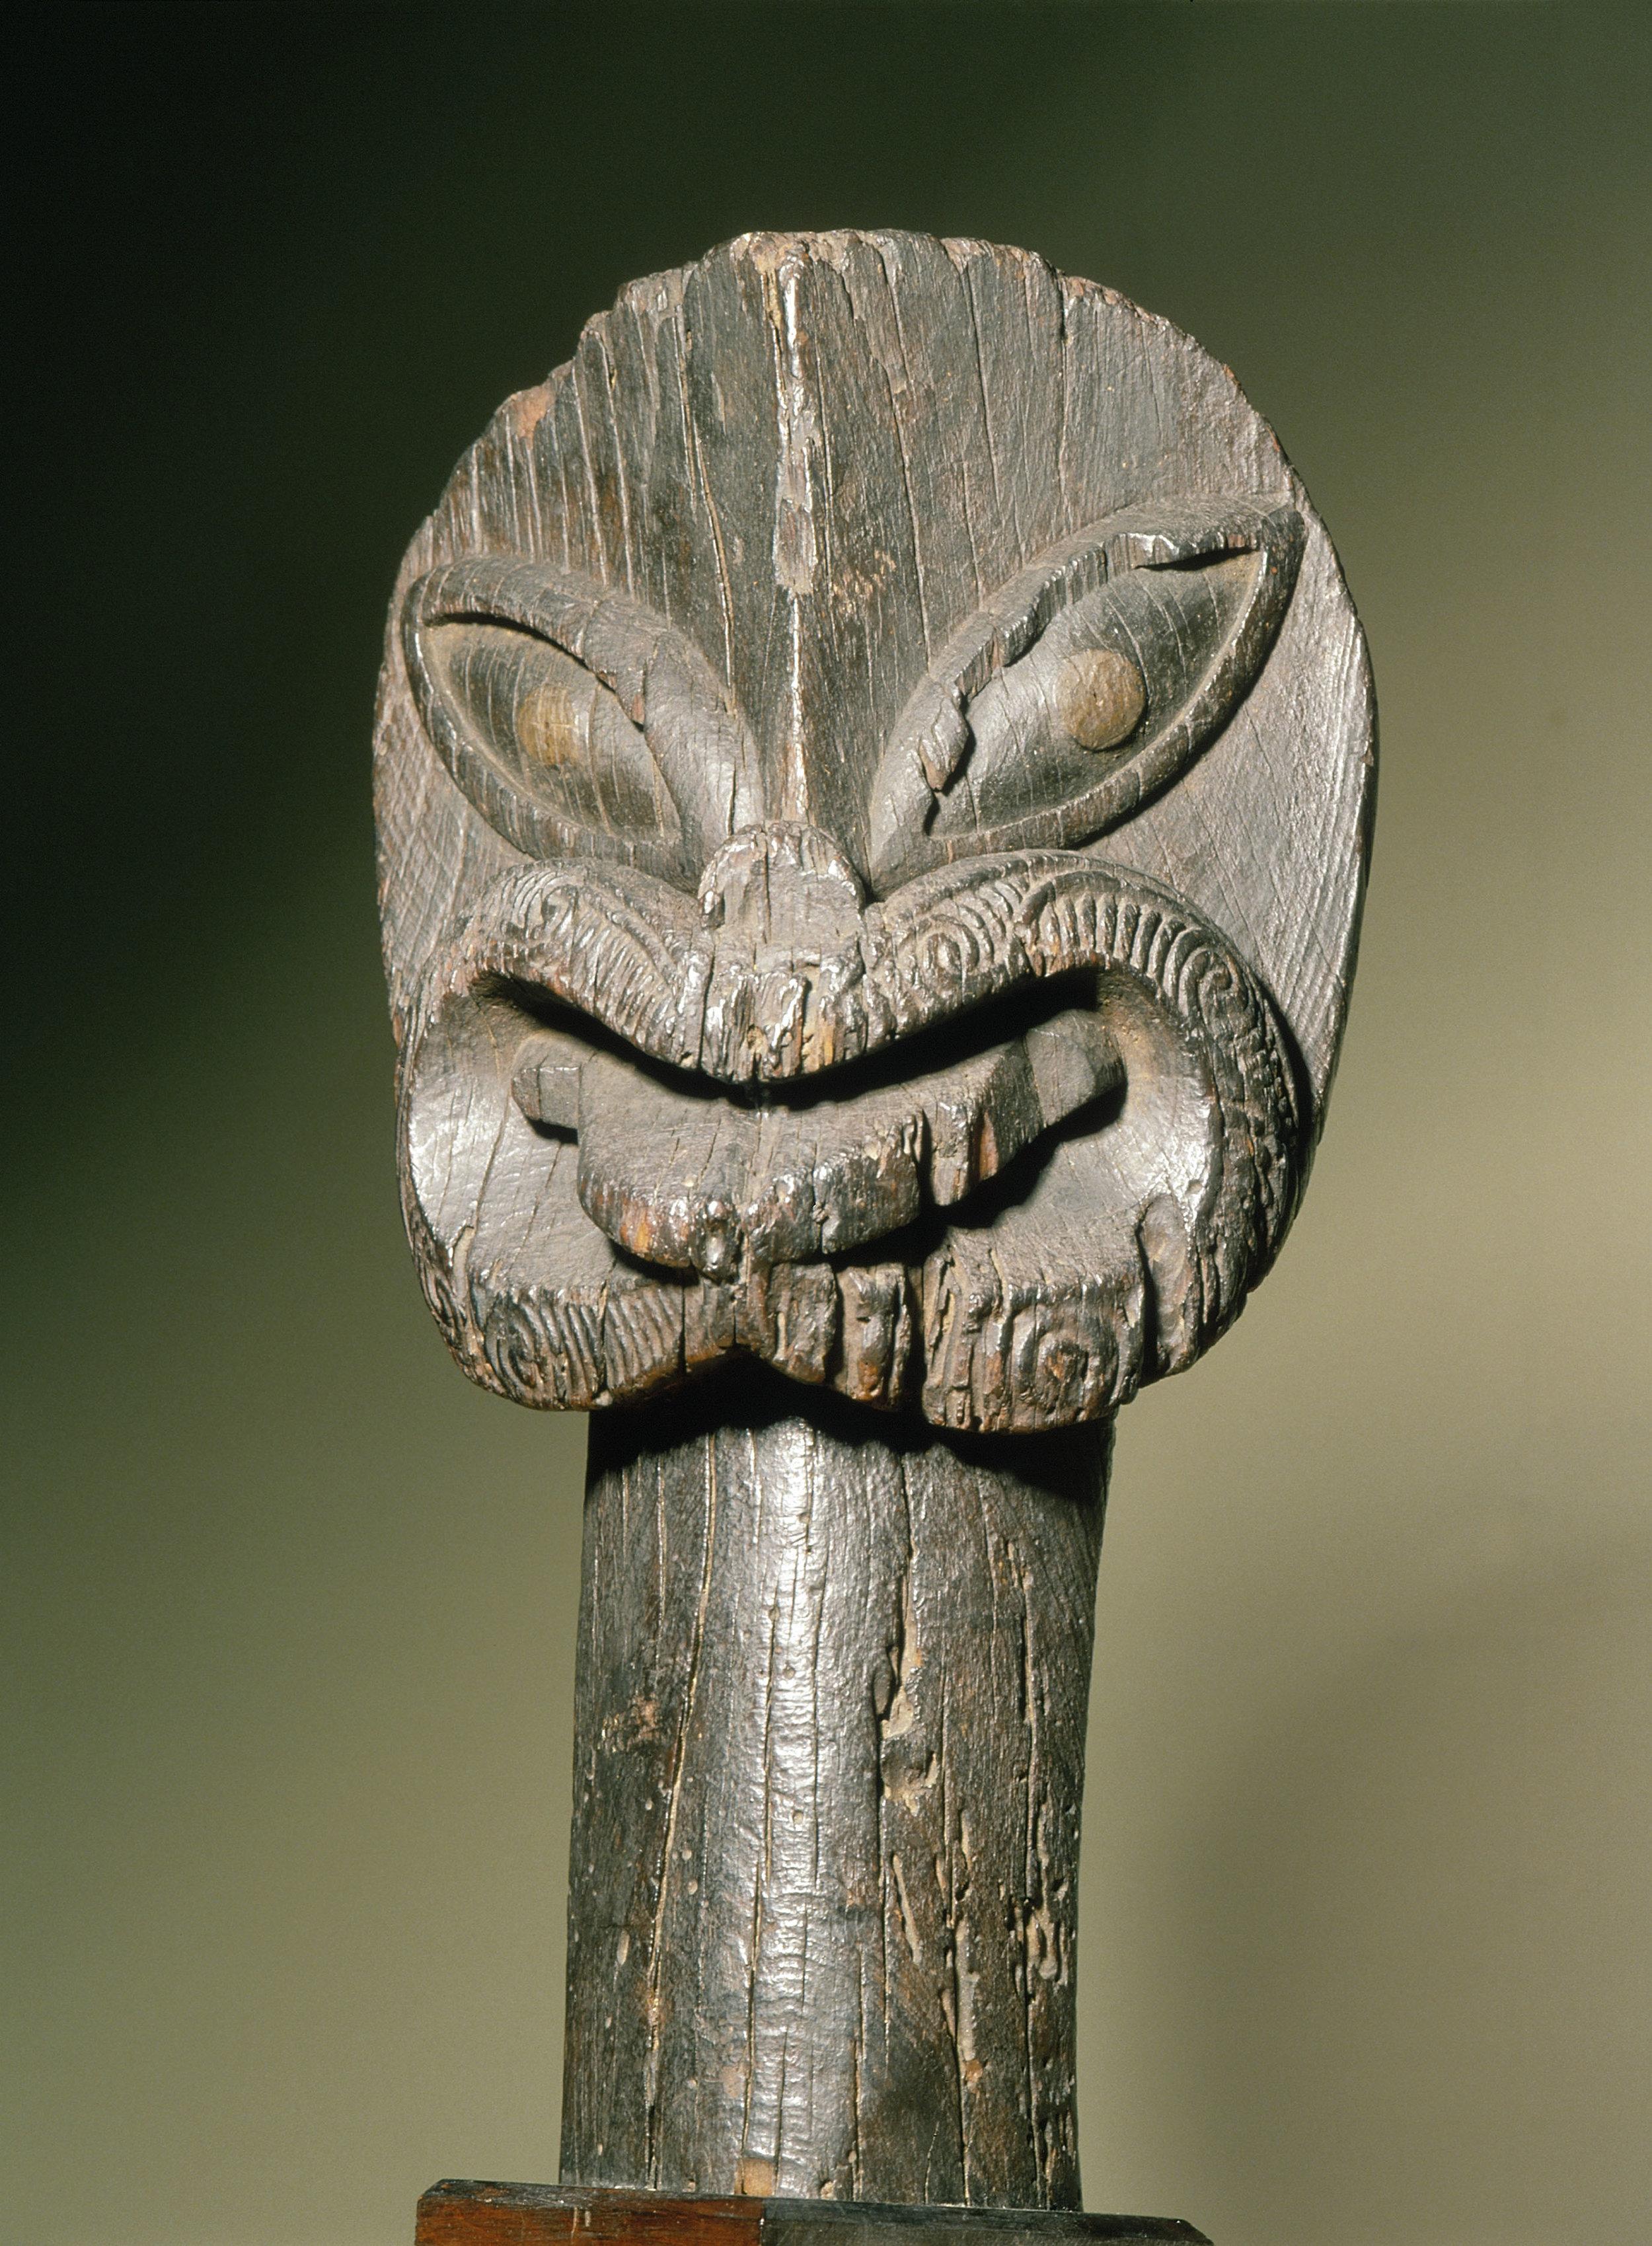 A fine early canoe figurehead.   Tauhiu, Long Beach, Otago area.   17th - 18th century   Inv. #: 55405013 © Werner Forman Archive / Otago Museum, Dunedin